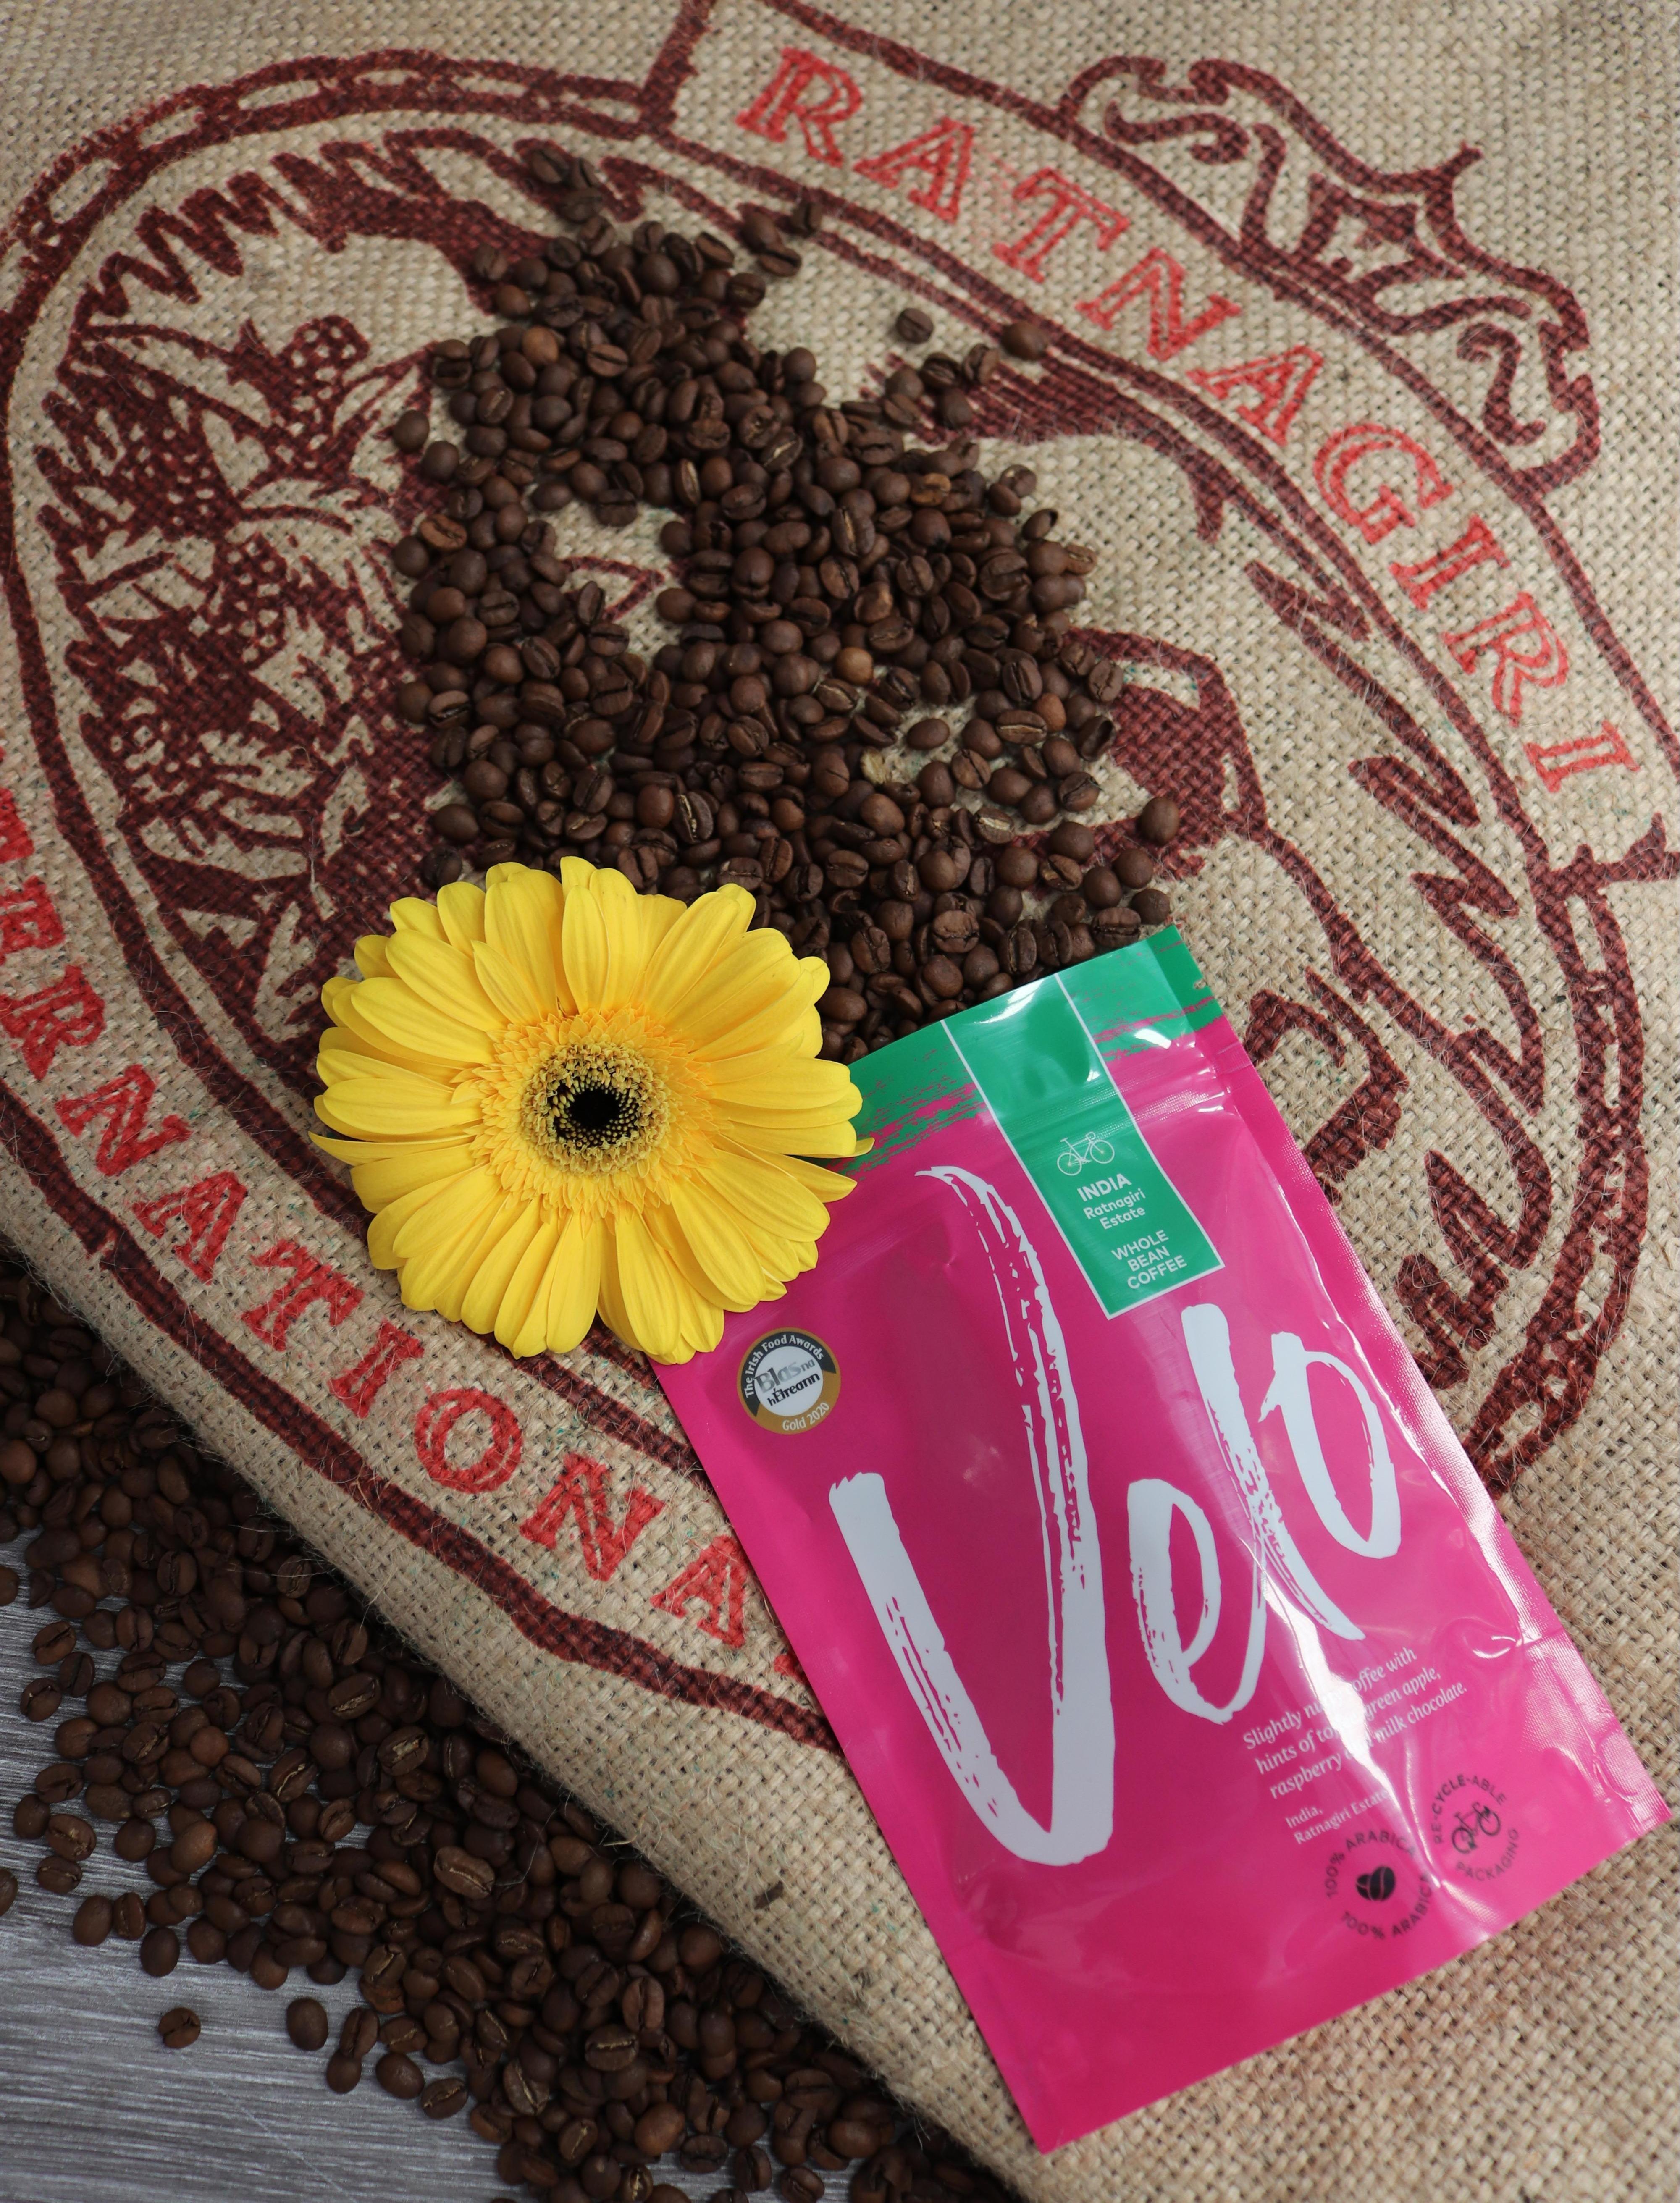 Velo Coffee Roaster India Ratnagiri